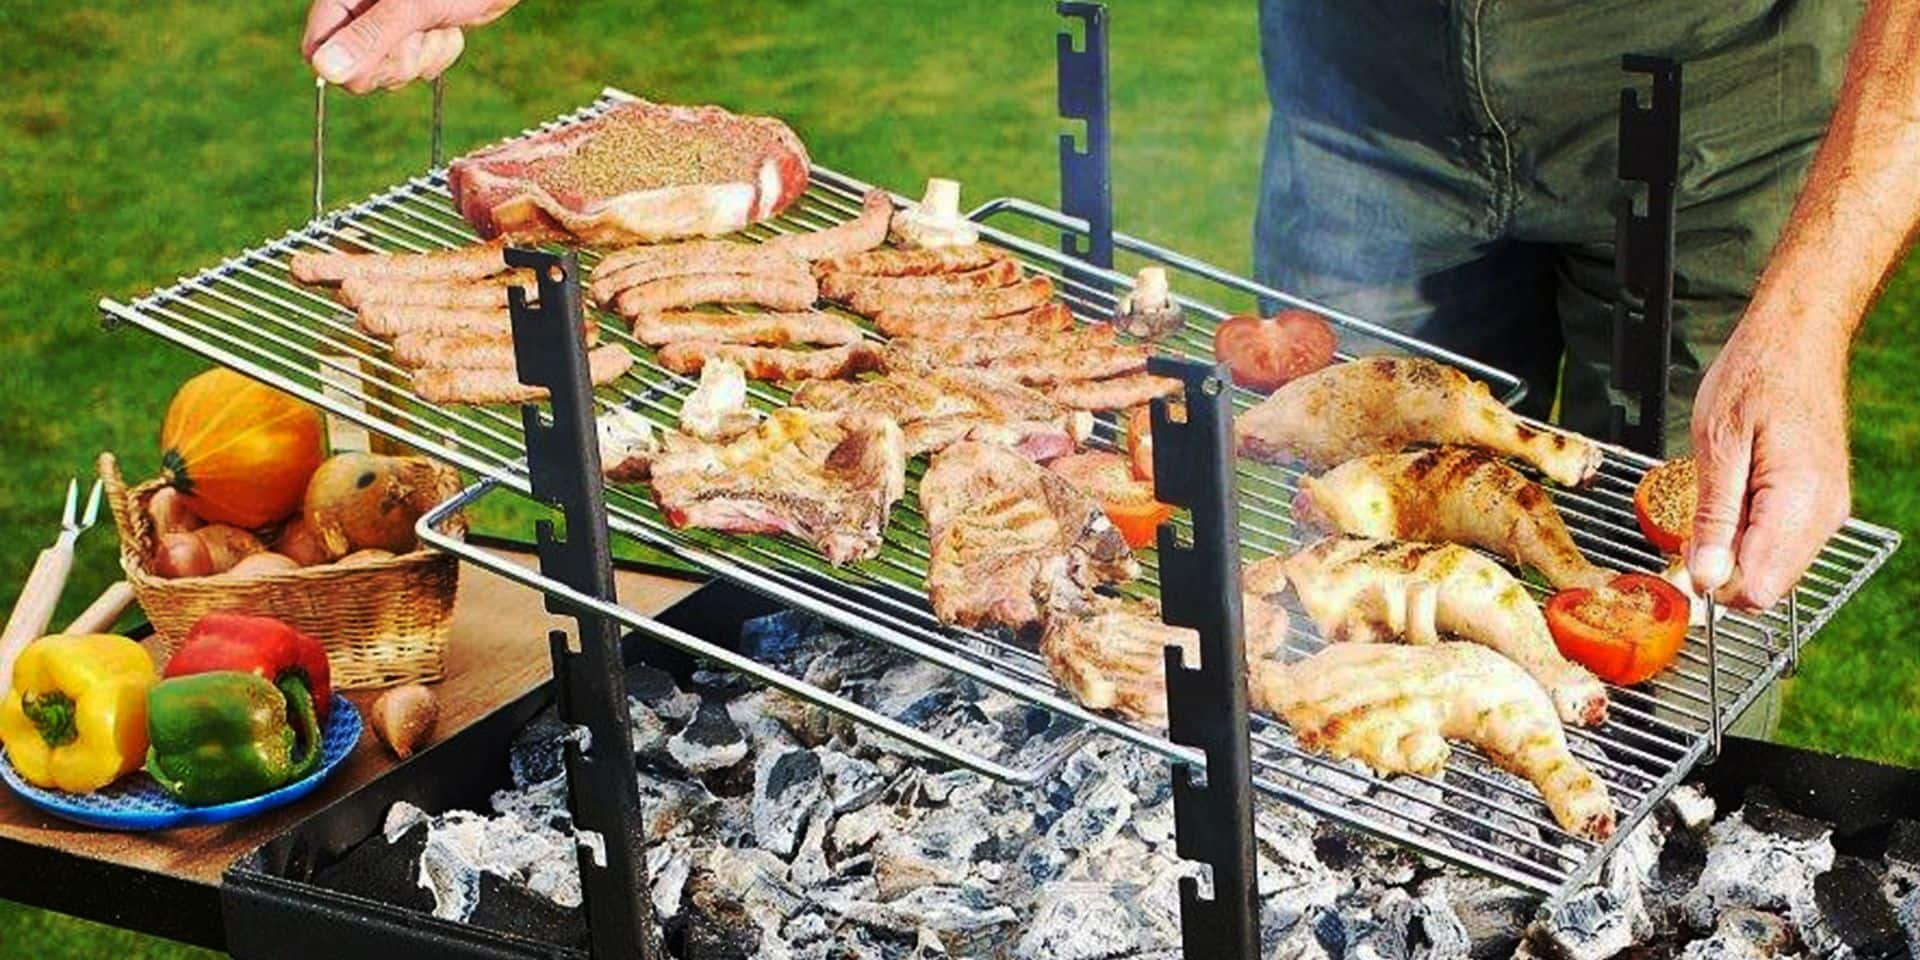 Comment Faire Un Bon Barbecue nettoyer sa grille, le premier geste pour un barbecue sain